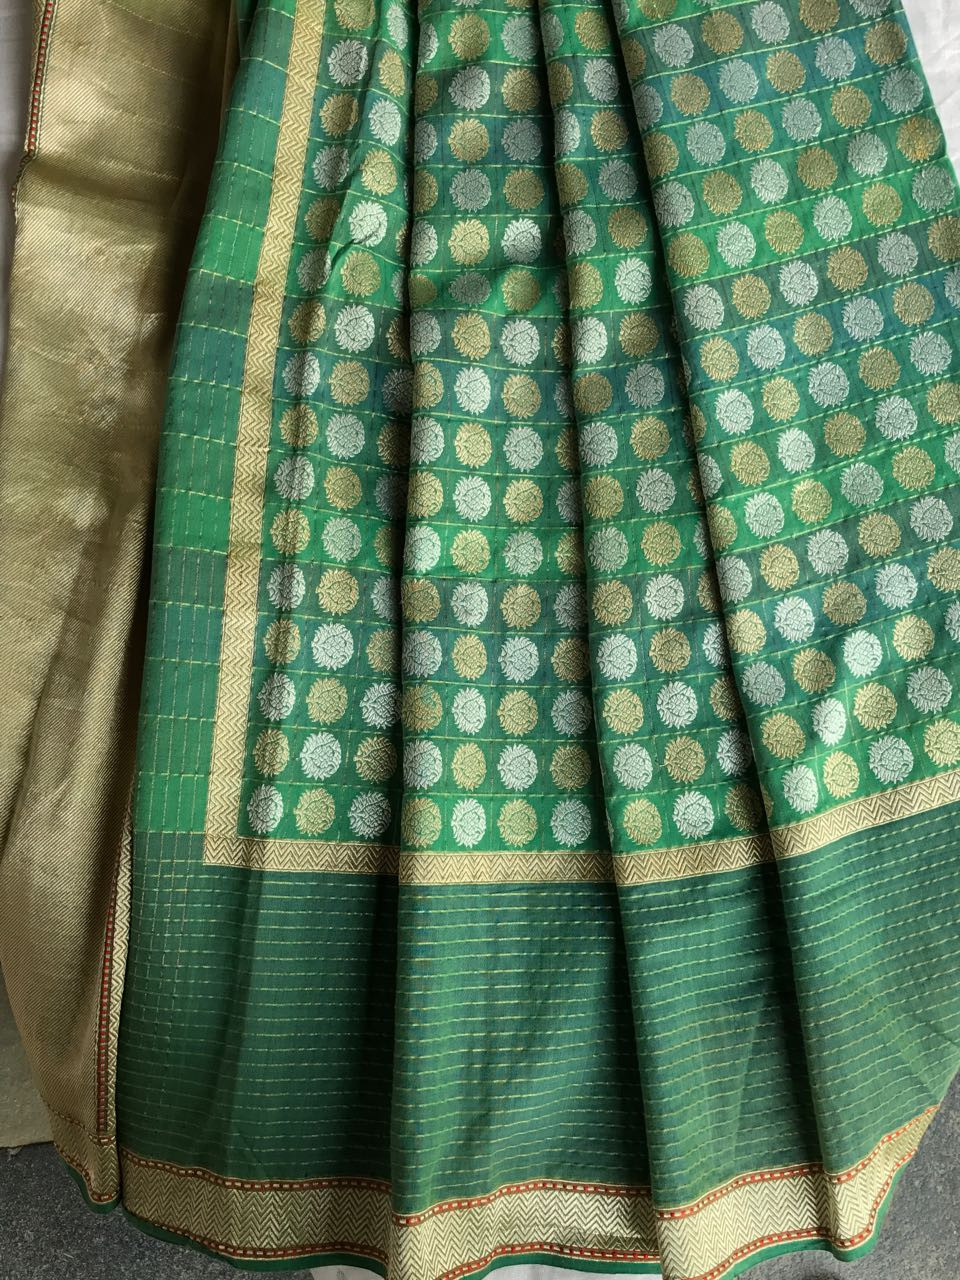 CC- 22/15 SL- 1 - Low twist Karnataka silk with loom embroidered body pattern in silk